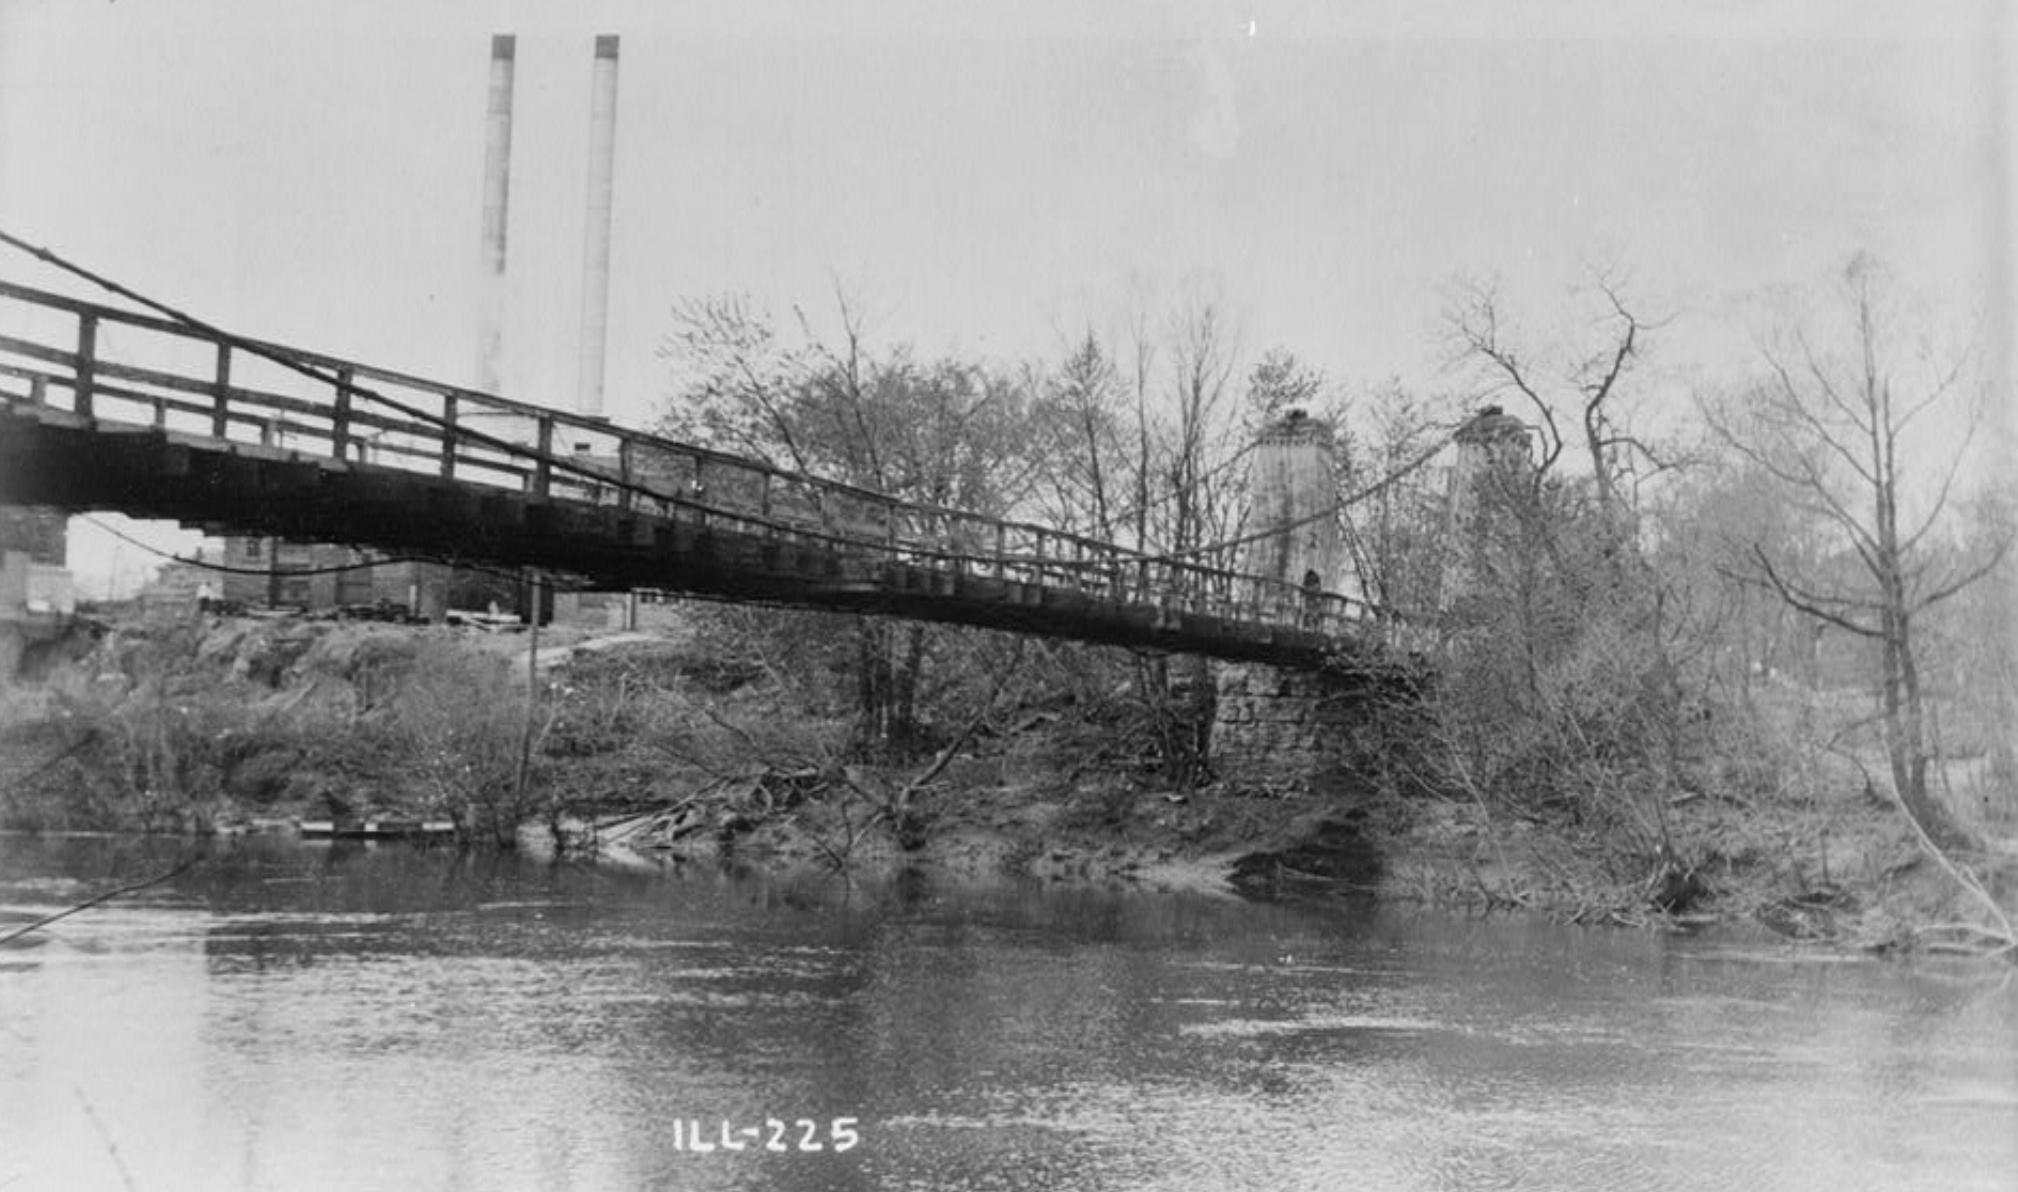 Black and white photo of historic suspension bridge in Carlyle Illinois